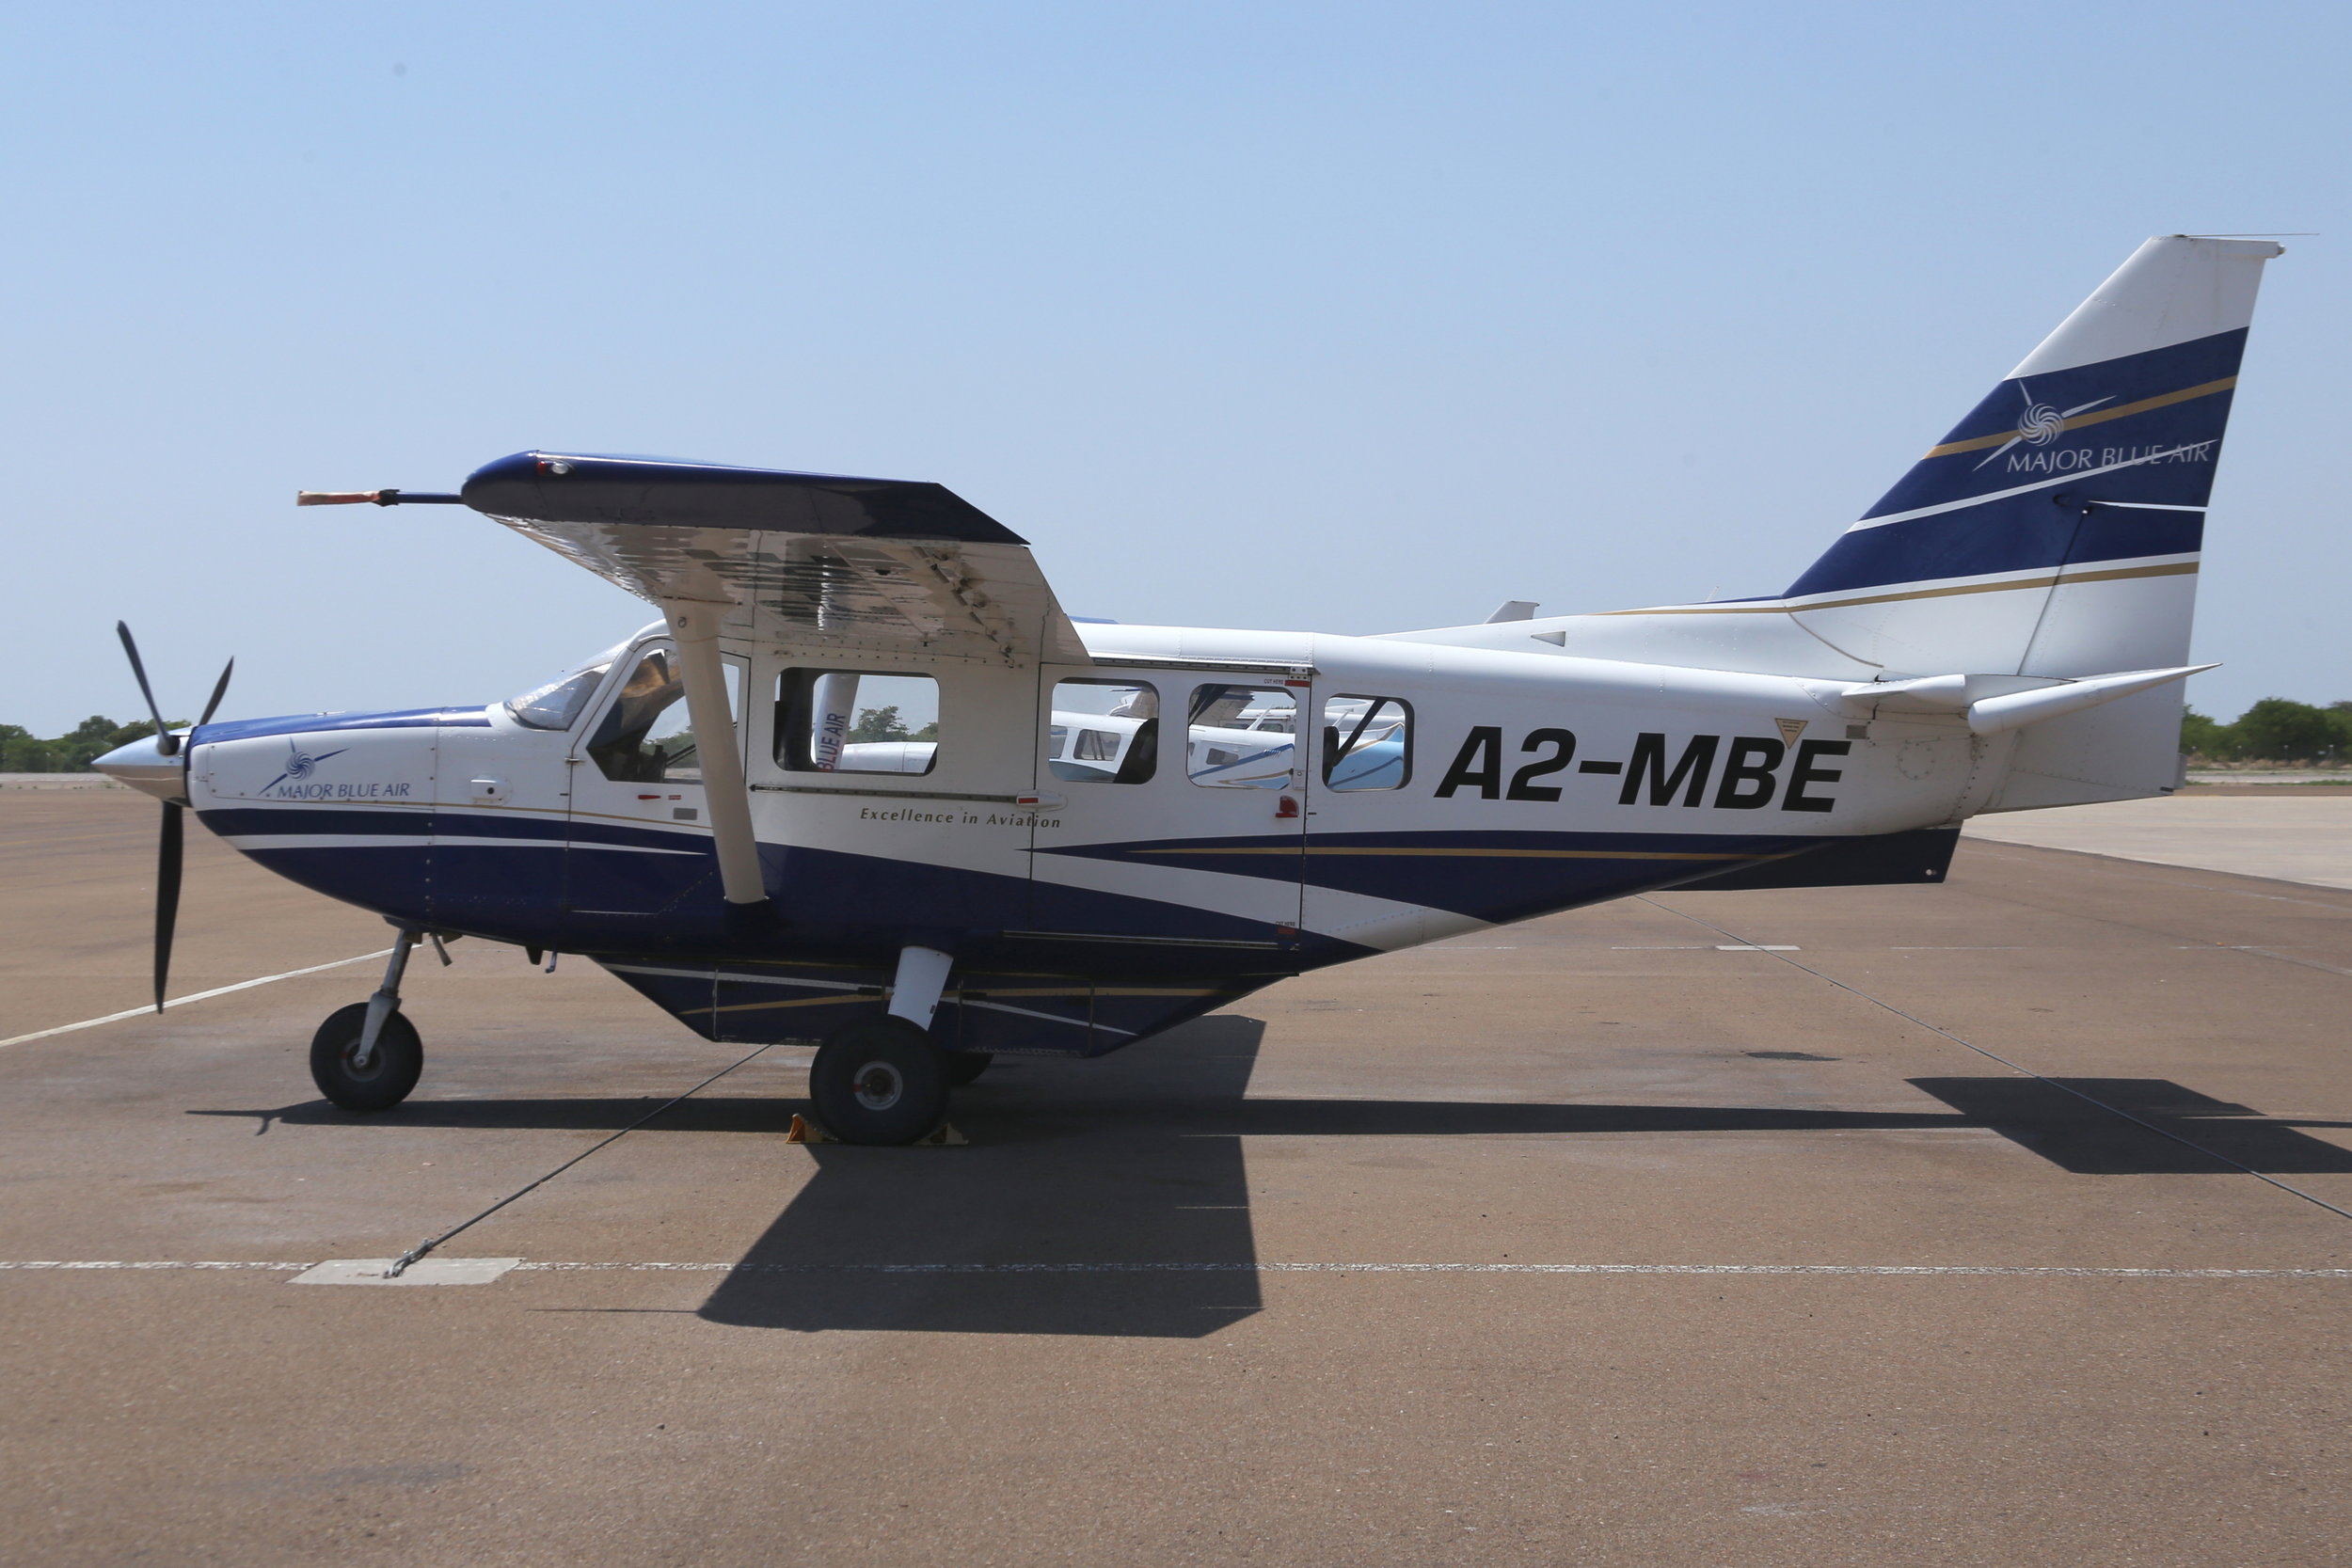 A2-MBE Major Blue Air Gippsland Airvan taken at Muan, Botswana 15th November 2018 by John Wood